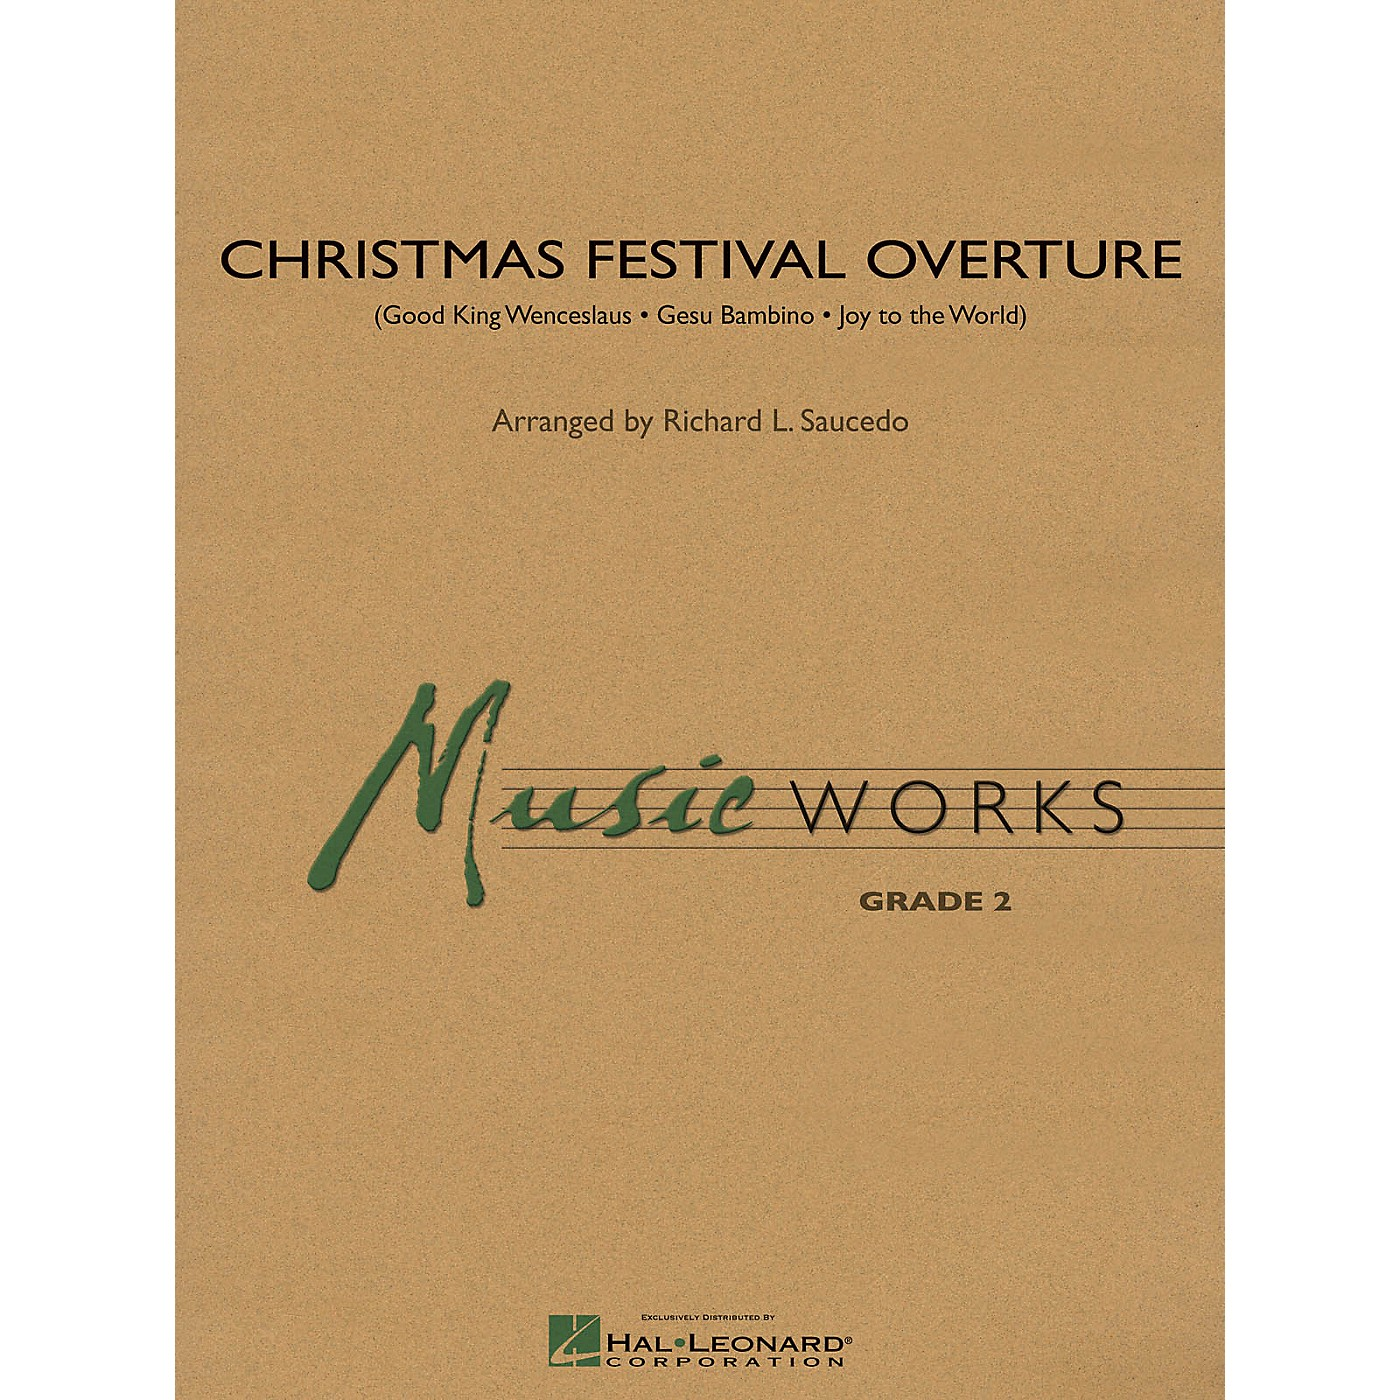 Hal Leonard Christmas Festival Overture Concert Band Level 2 Arranged by Richard L. Saucedo thumbnail